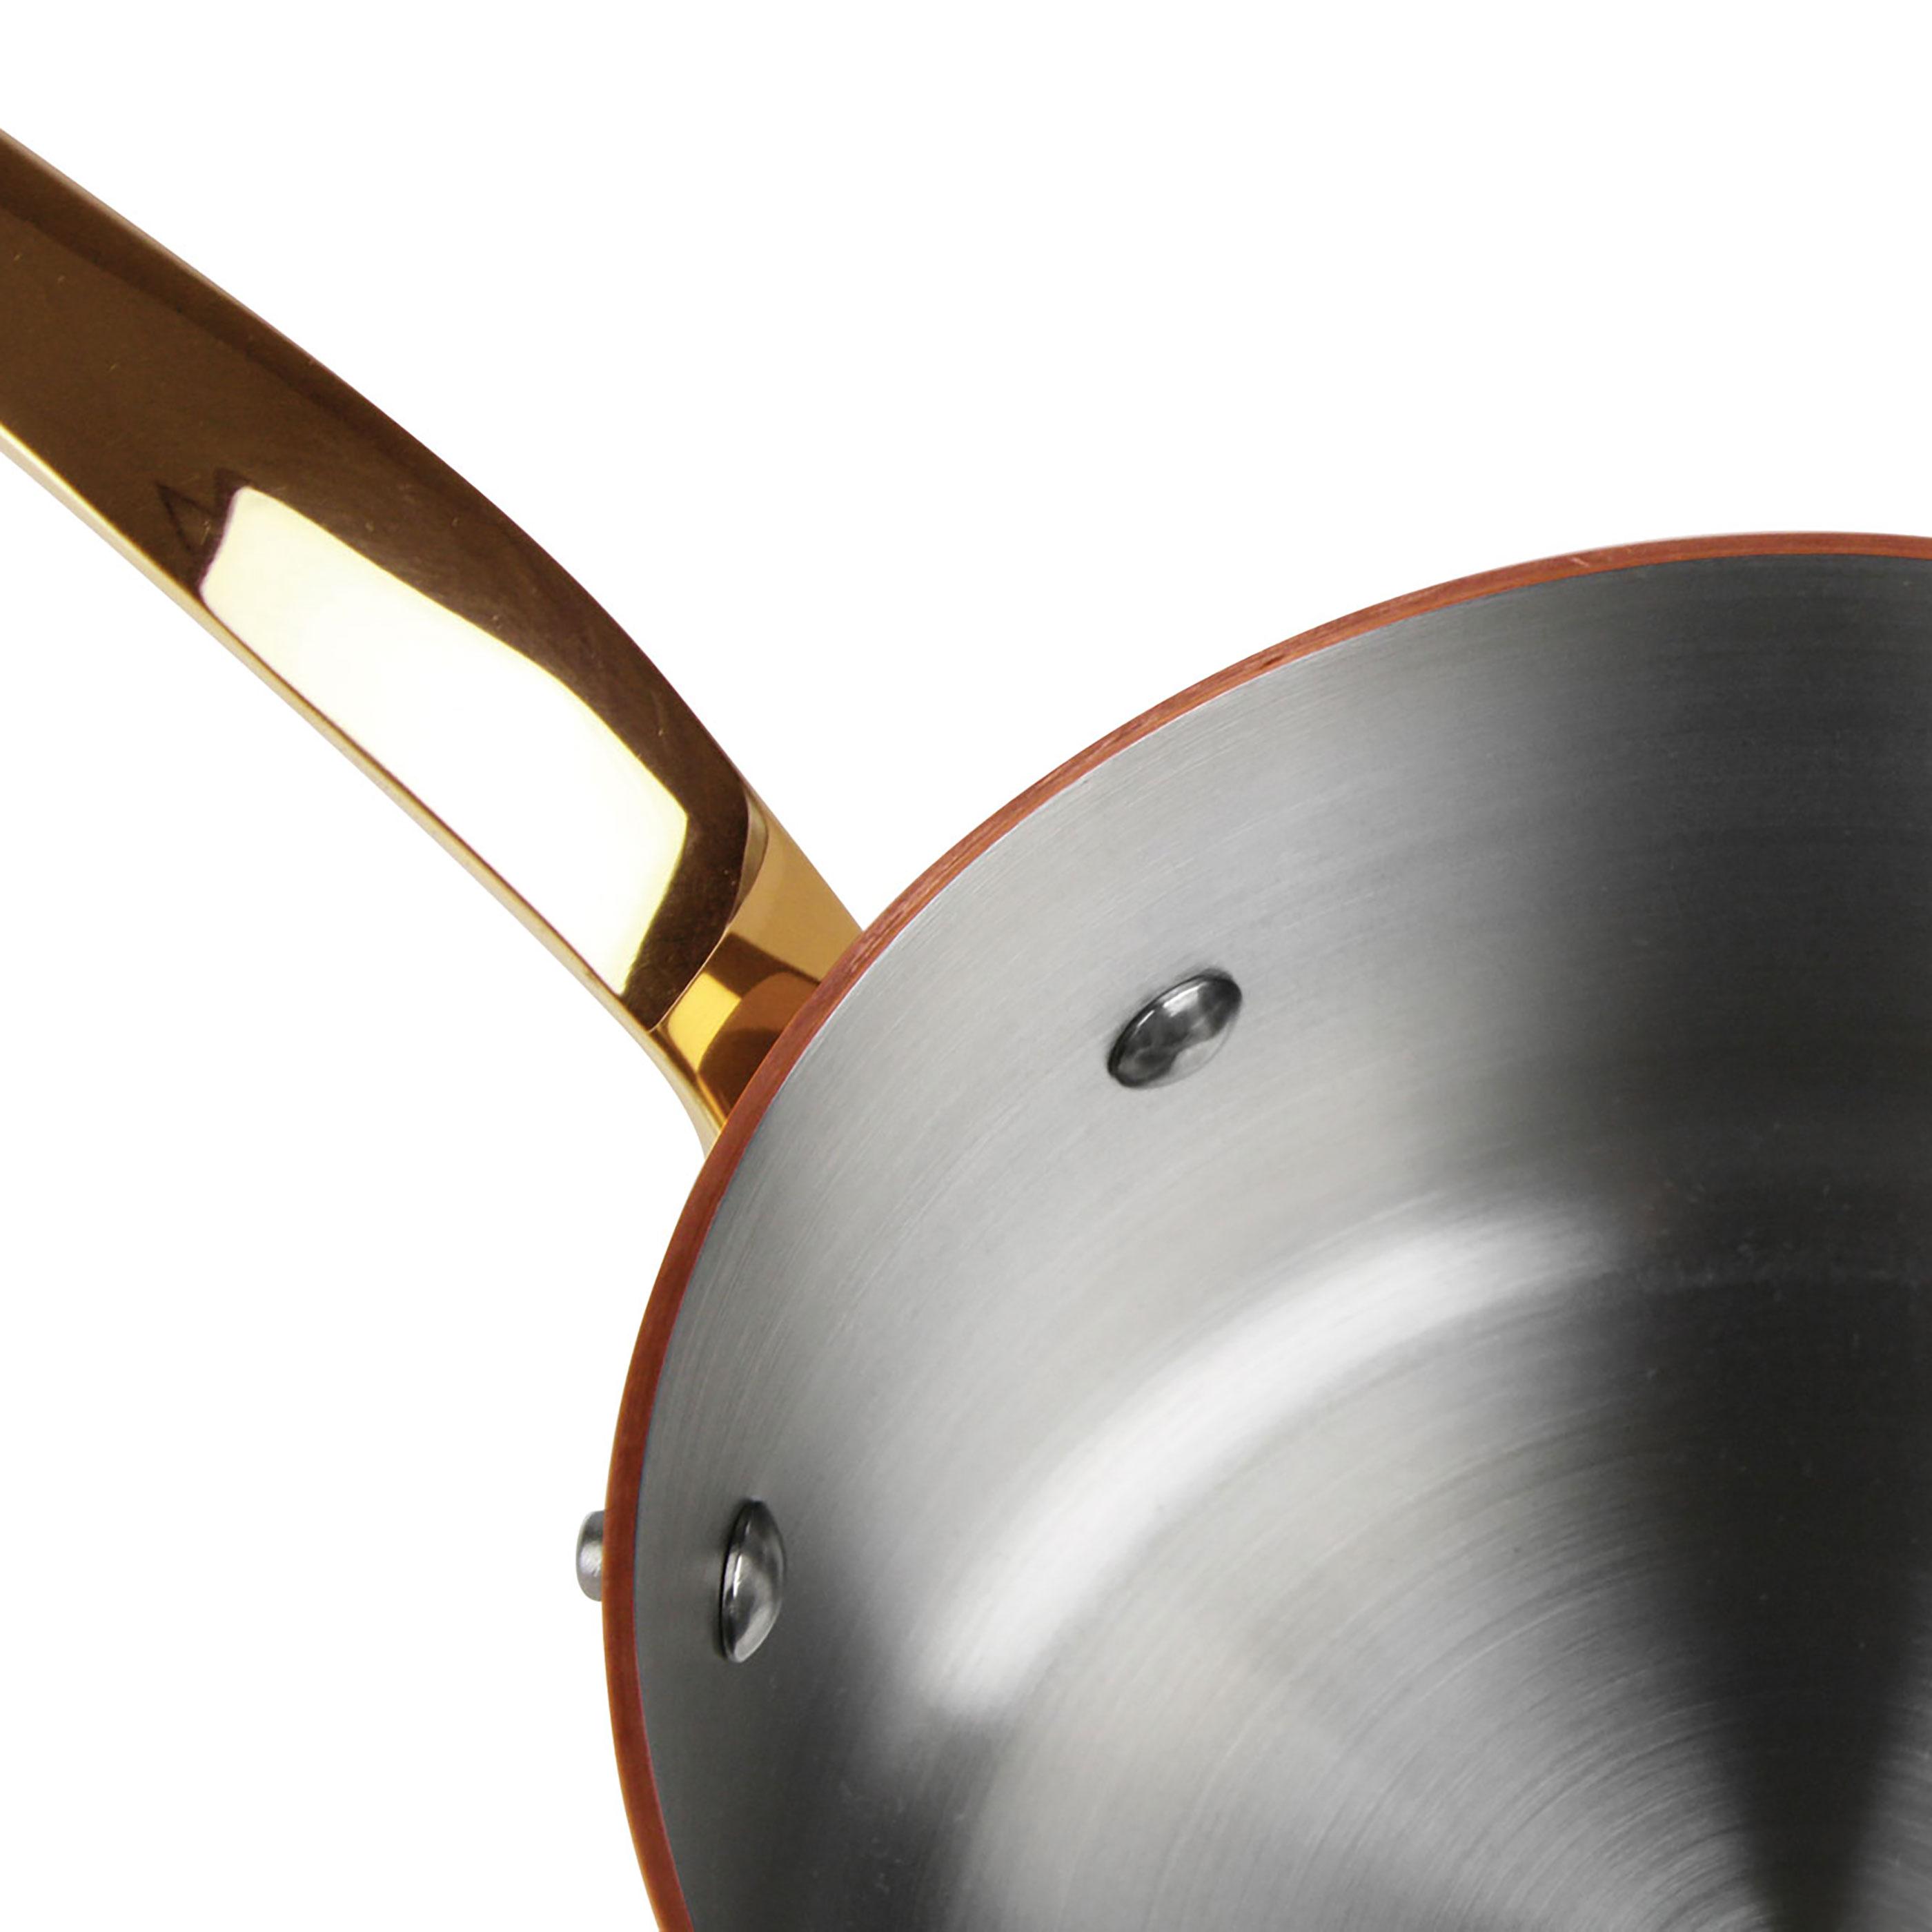 Mauviel M Heritage 250b Copper Cookware Set 3 Piece